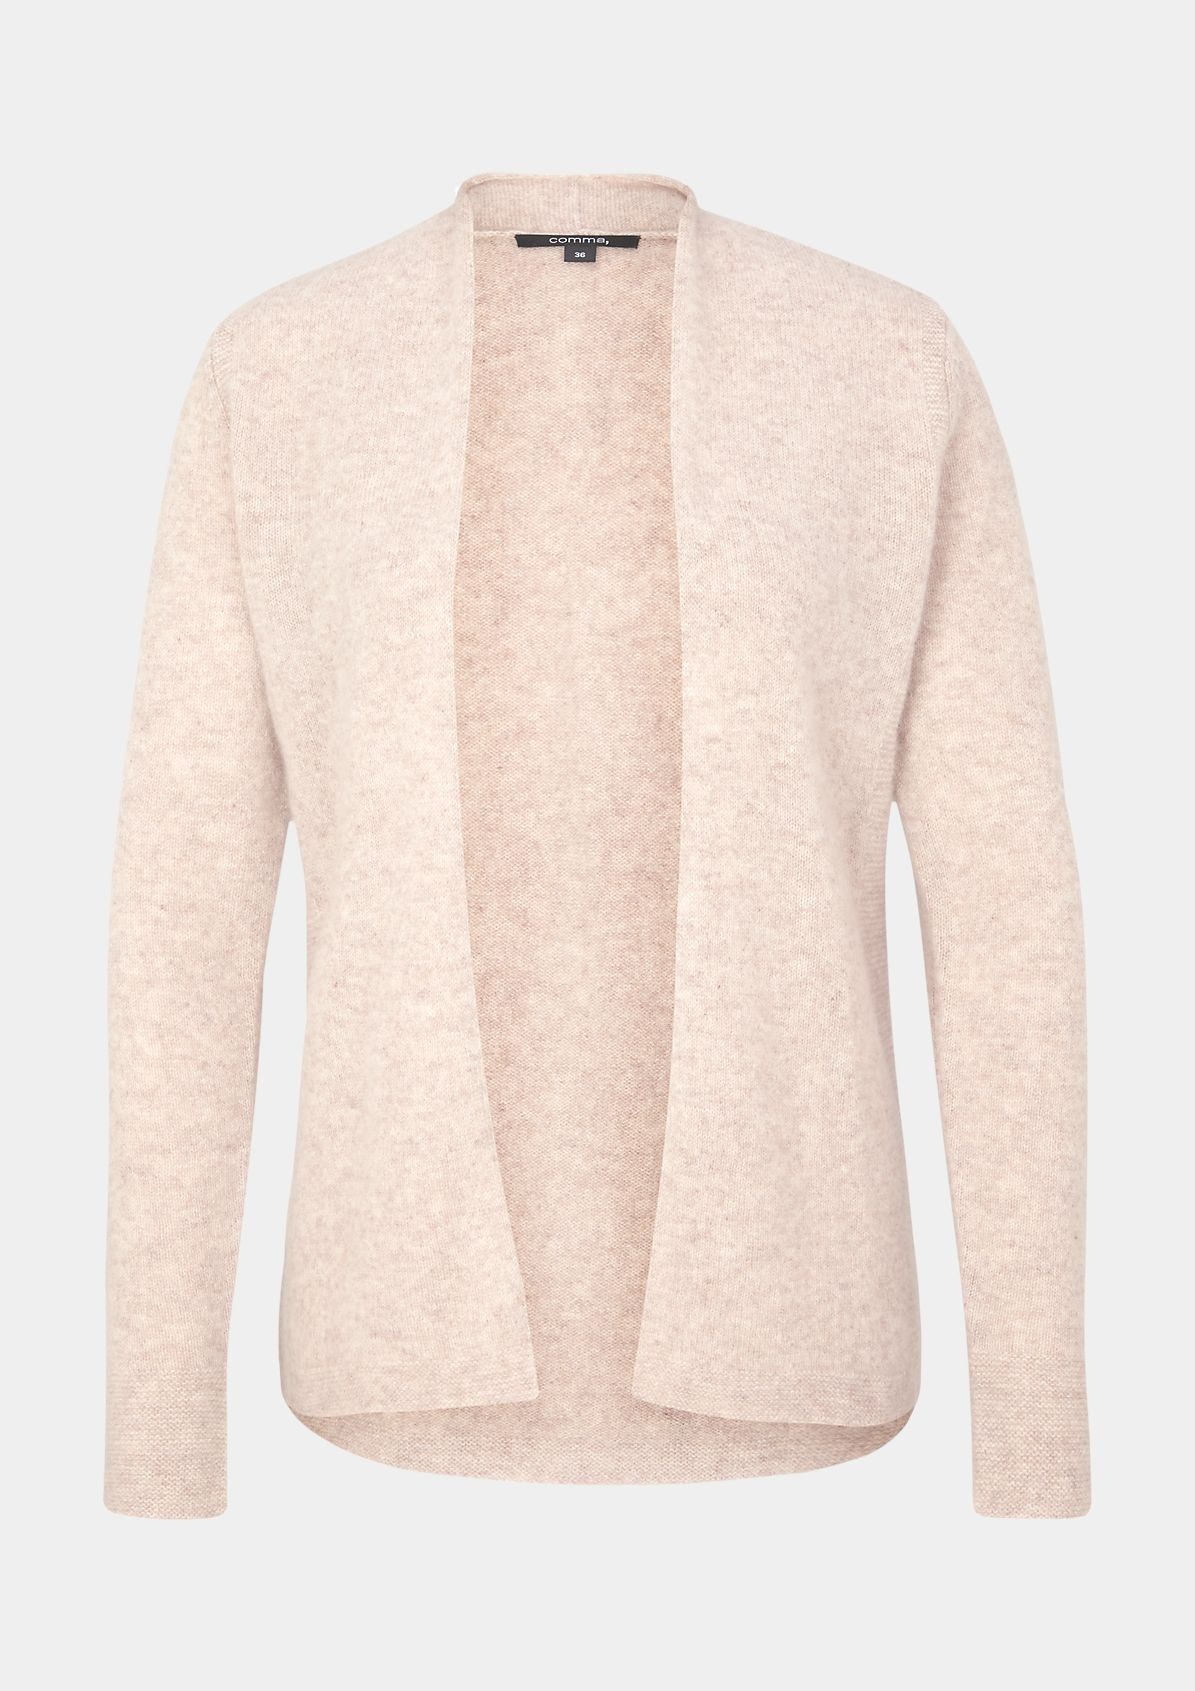 87.811.64.2017 Strickjacke   Fashion & Mode   comma Online Store